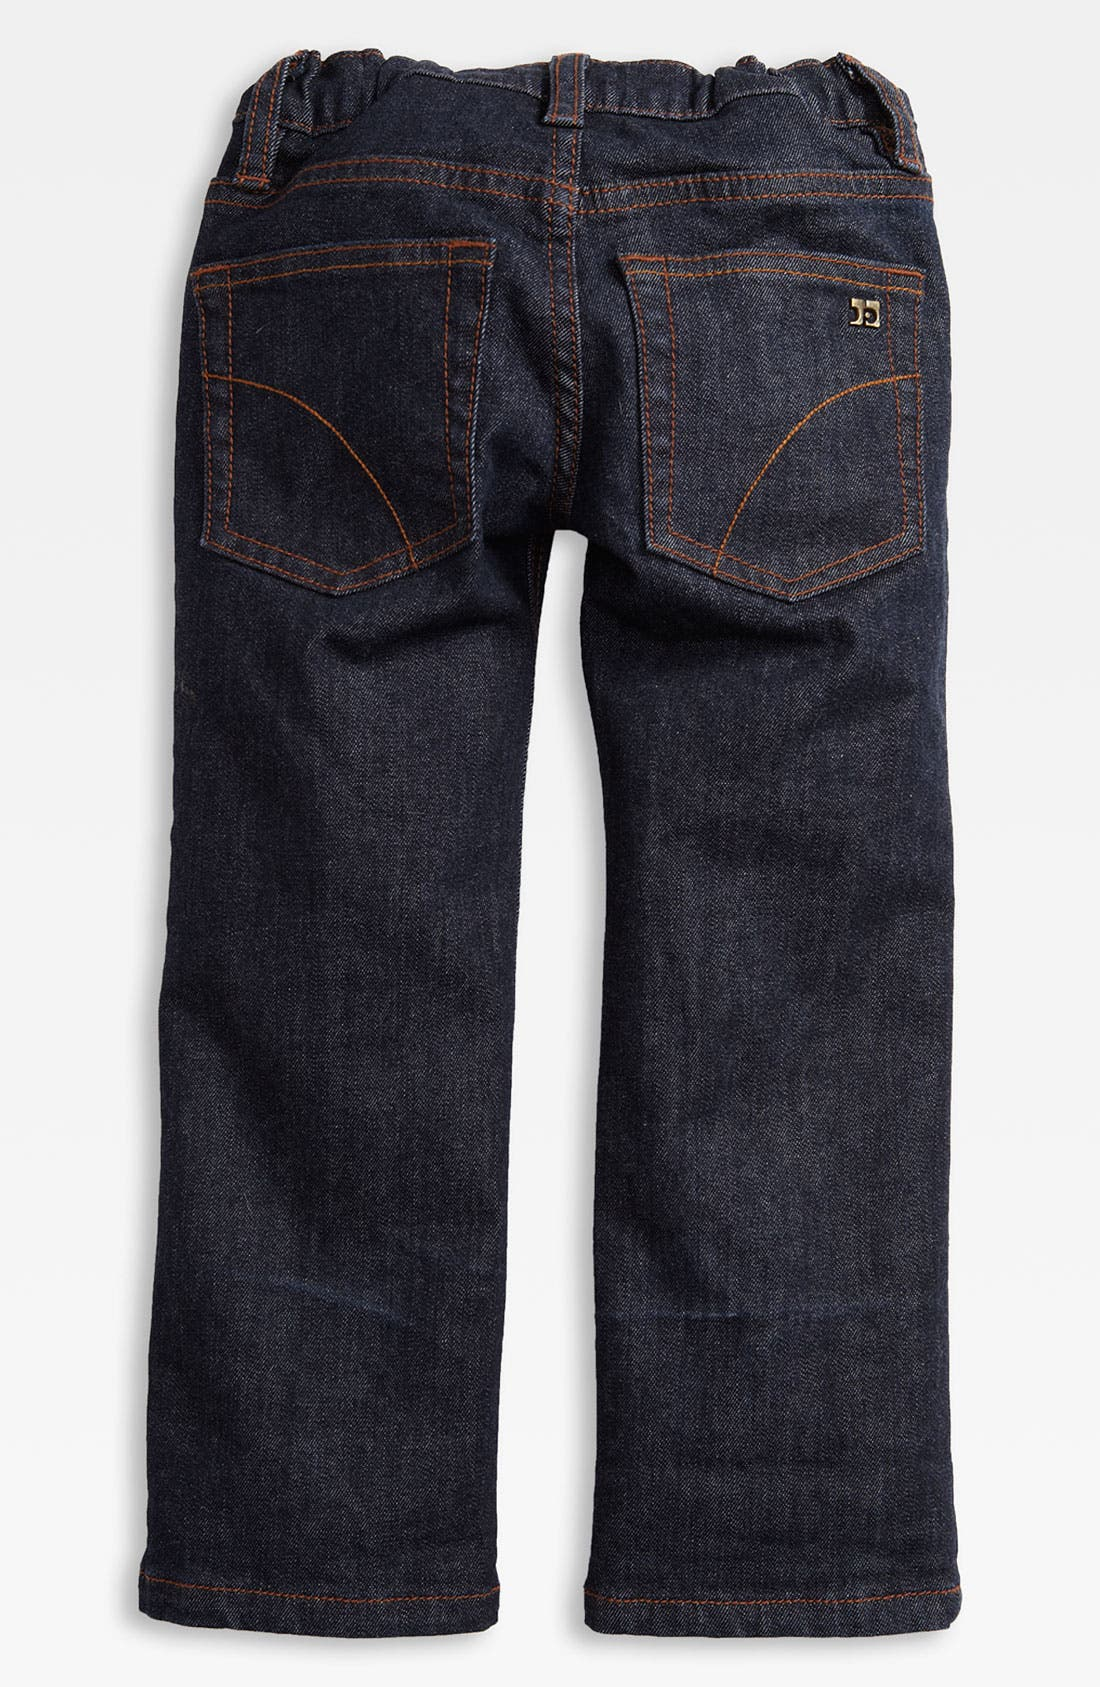 Alternate Image 1 Selected - Joe's 'Brixton' Skinny Jeans (Toddler)